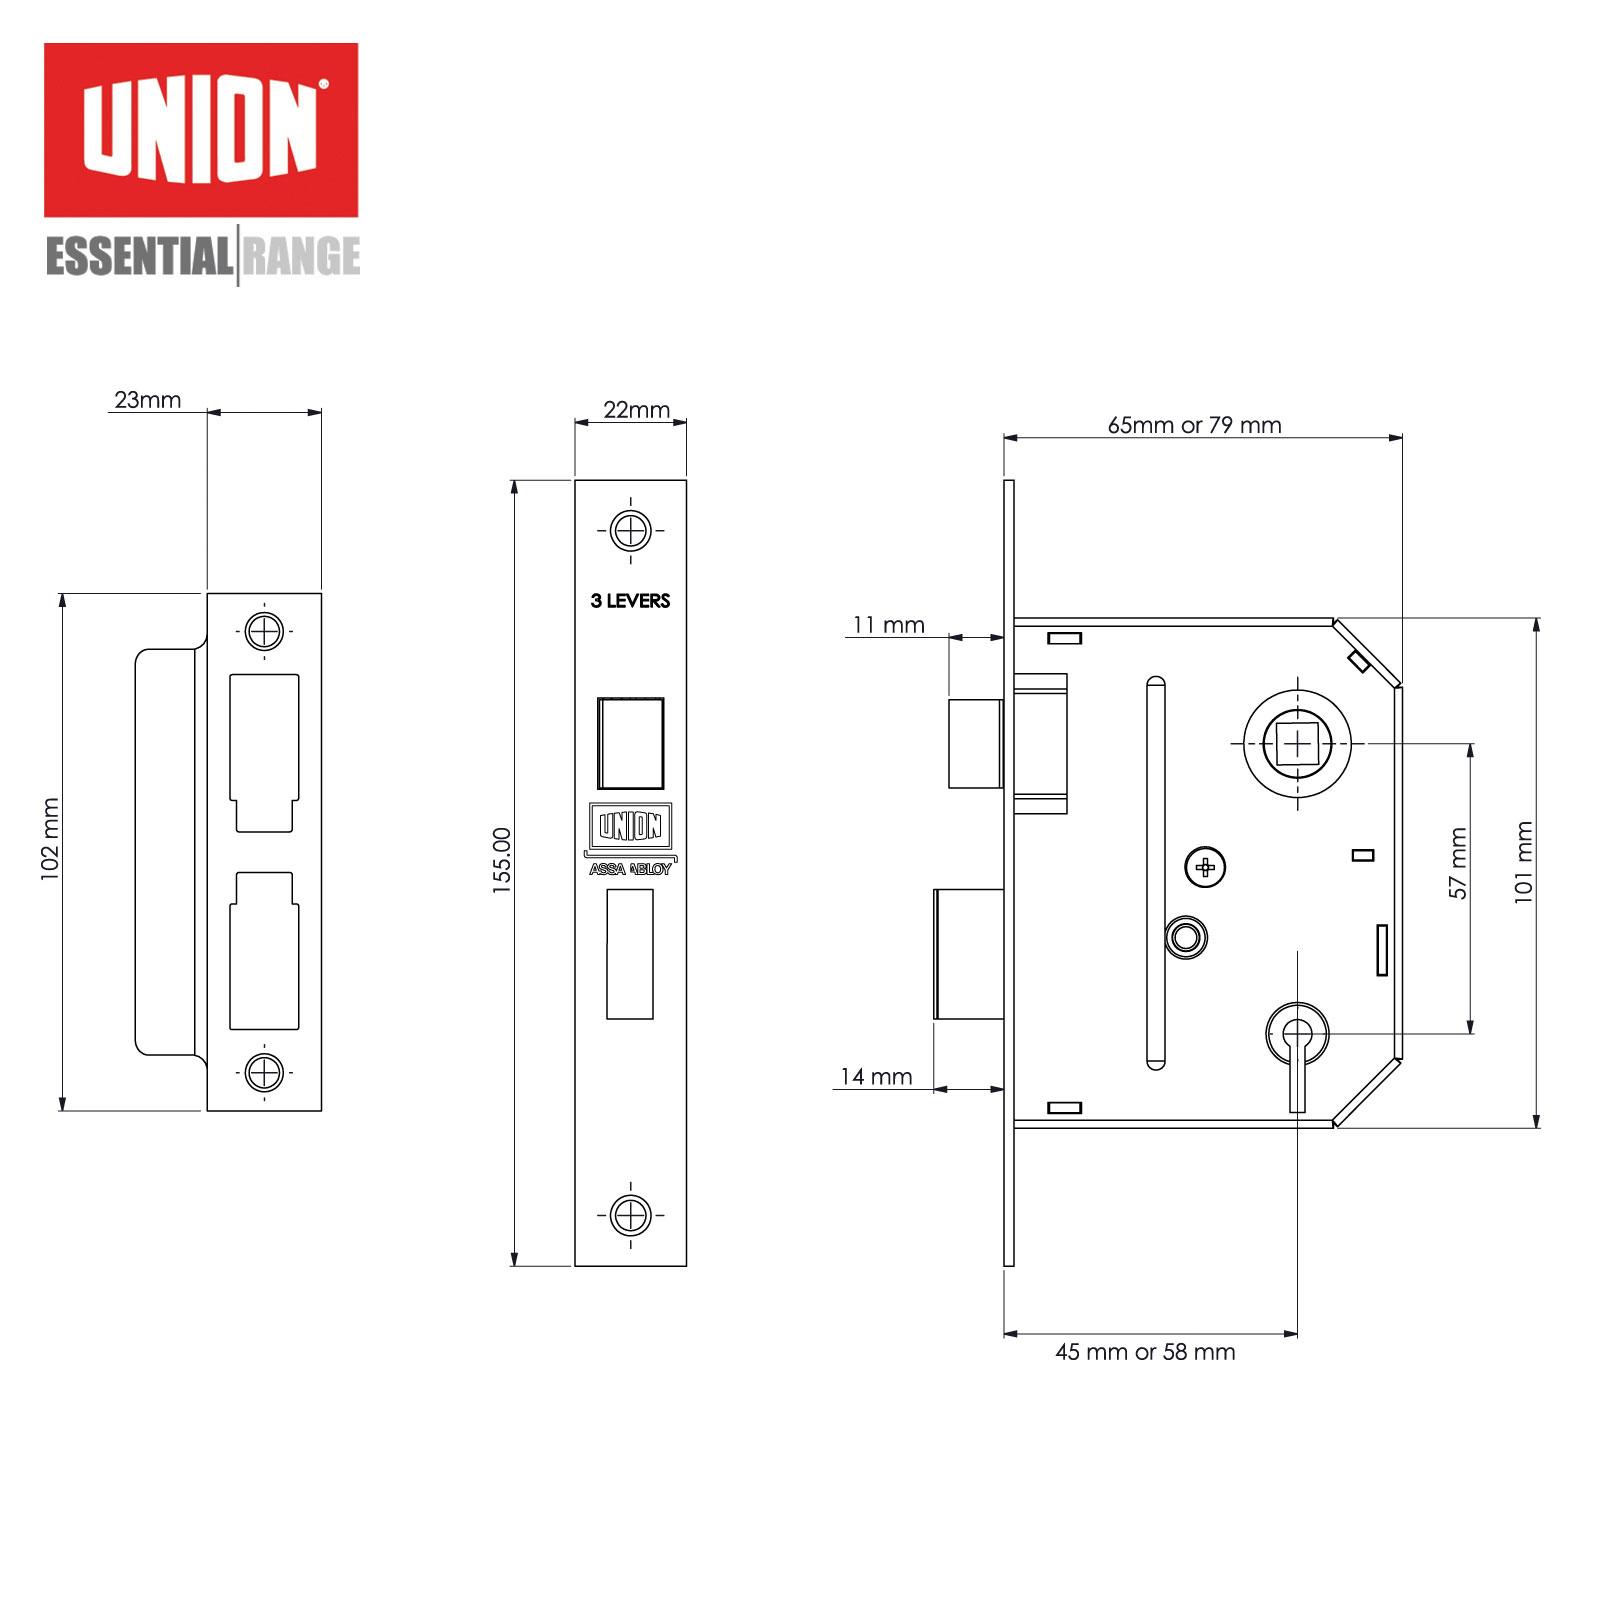 DIY Materials Union 3 Lever Sashlock Door Locks & Lock Mechanisms